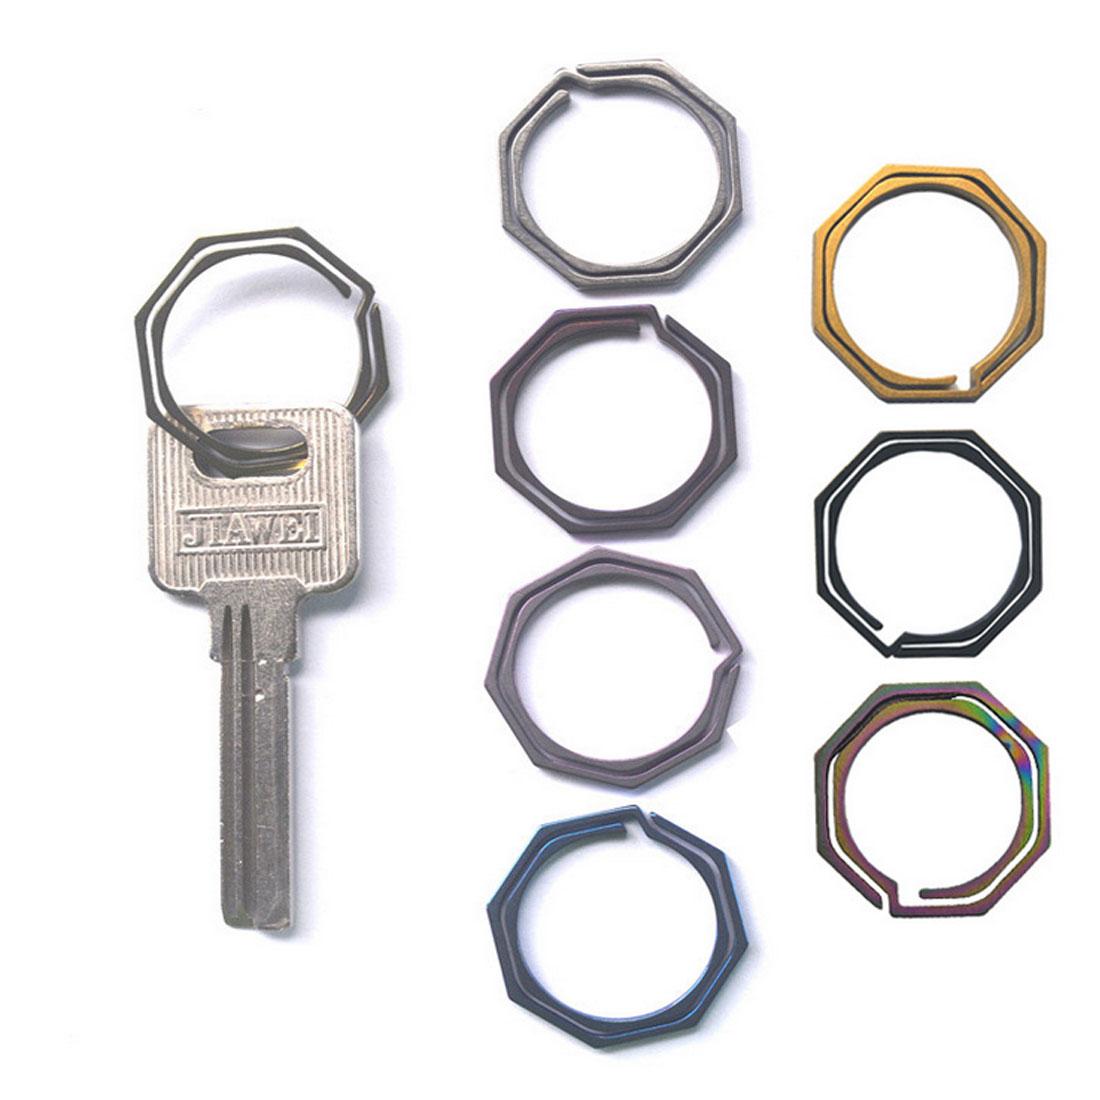 Gadget Titanium Alloy EDC Split Ring Key Chain Keyring Buckle Circle Octangle